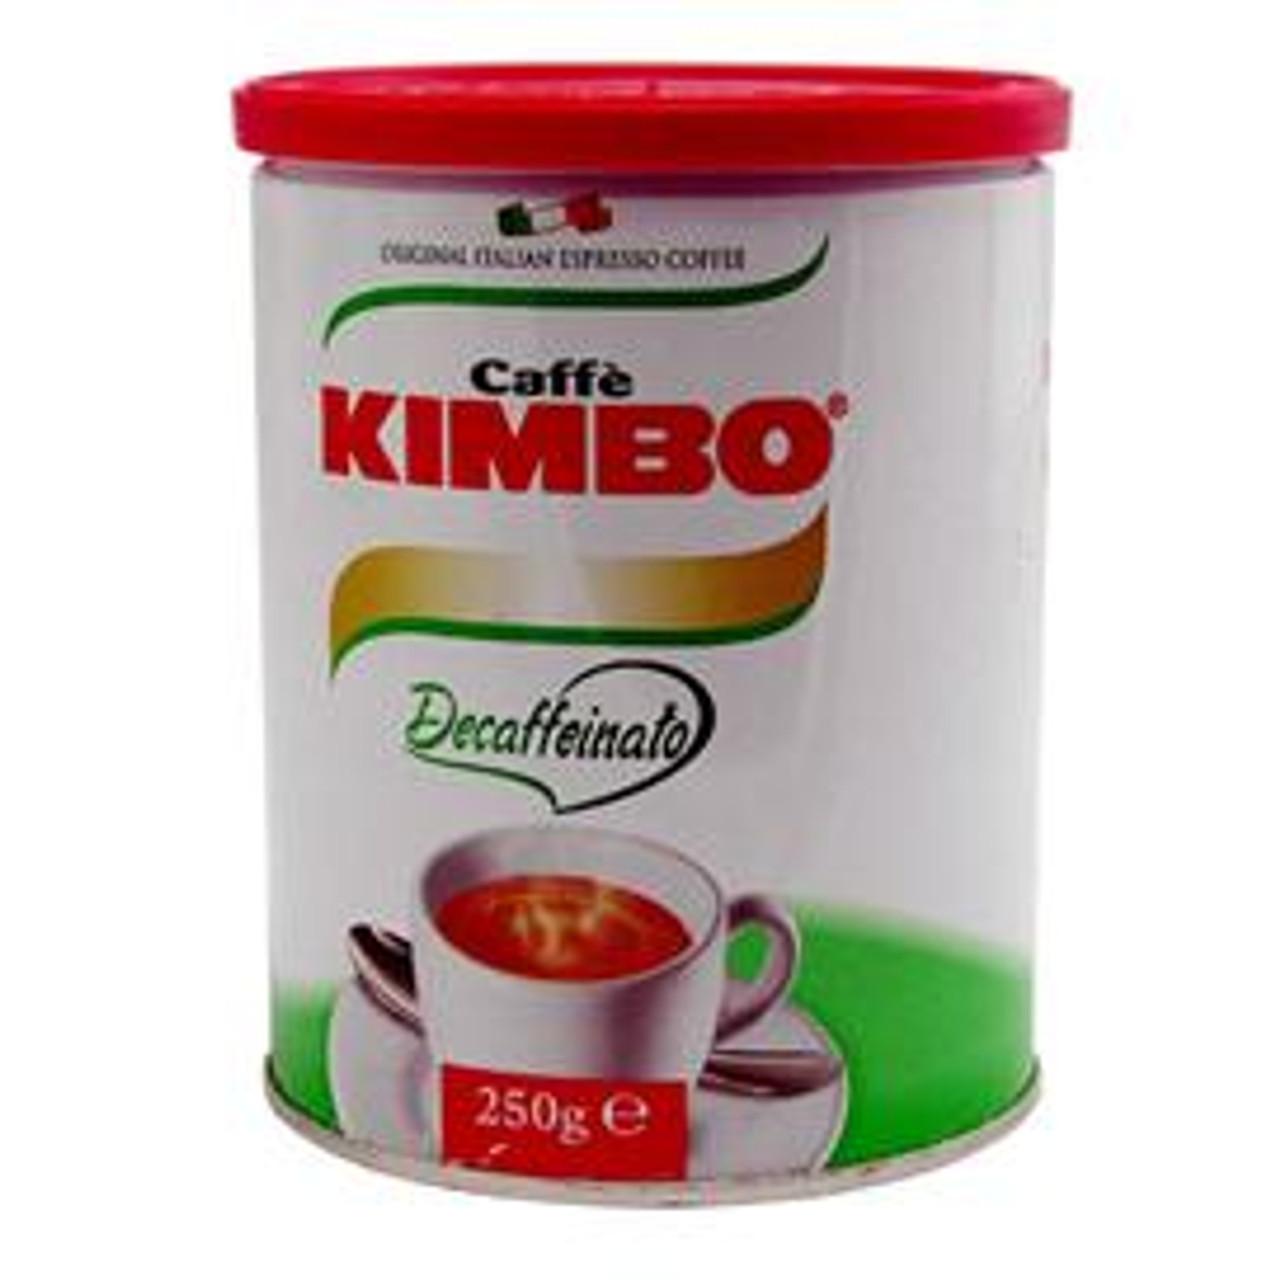 Caffe KIMBO Decaffeinated Espresso